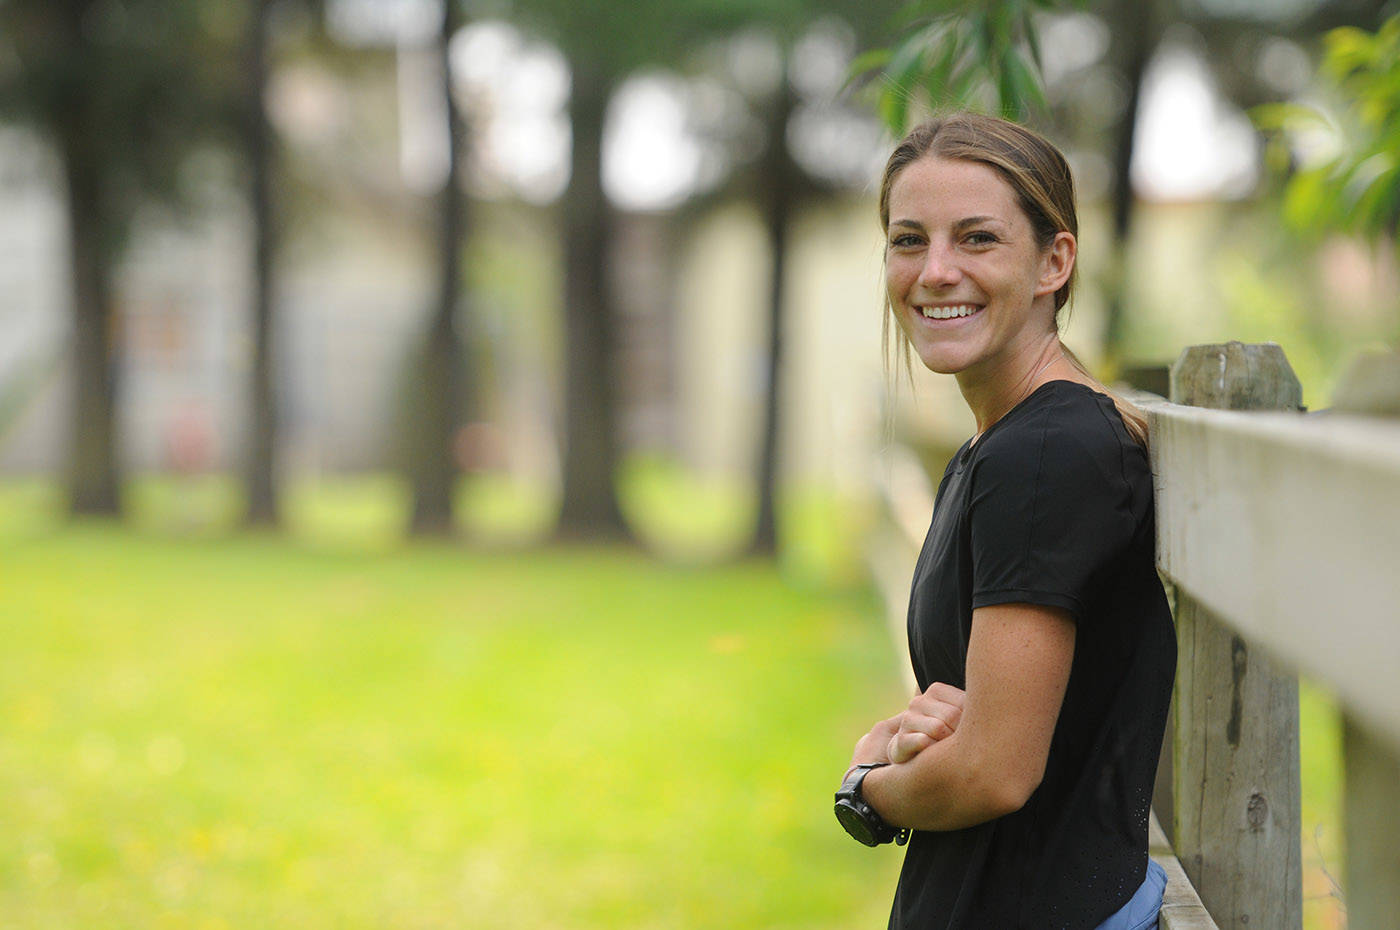 "Kalyn Head, seen here on June 4, 2021, will be running 100 kilometres for her ""birthday marathon"" fundraiser on July 23. (Jenna Hauck/ Chilliwack Progress)"